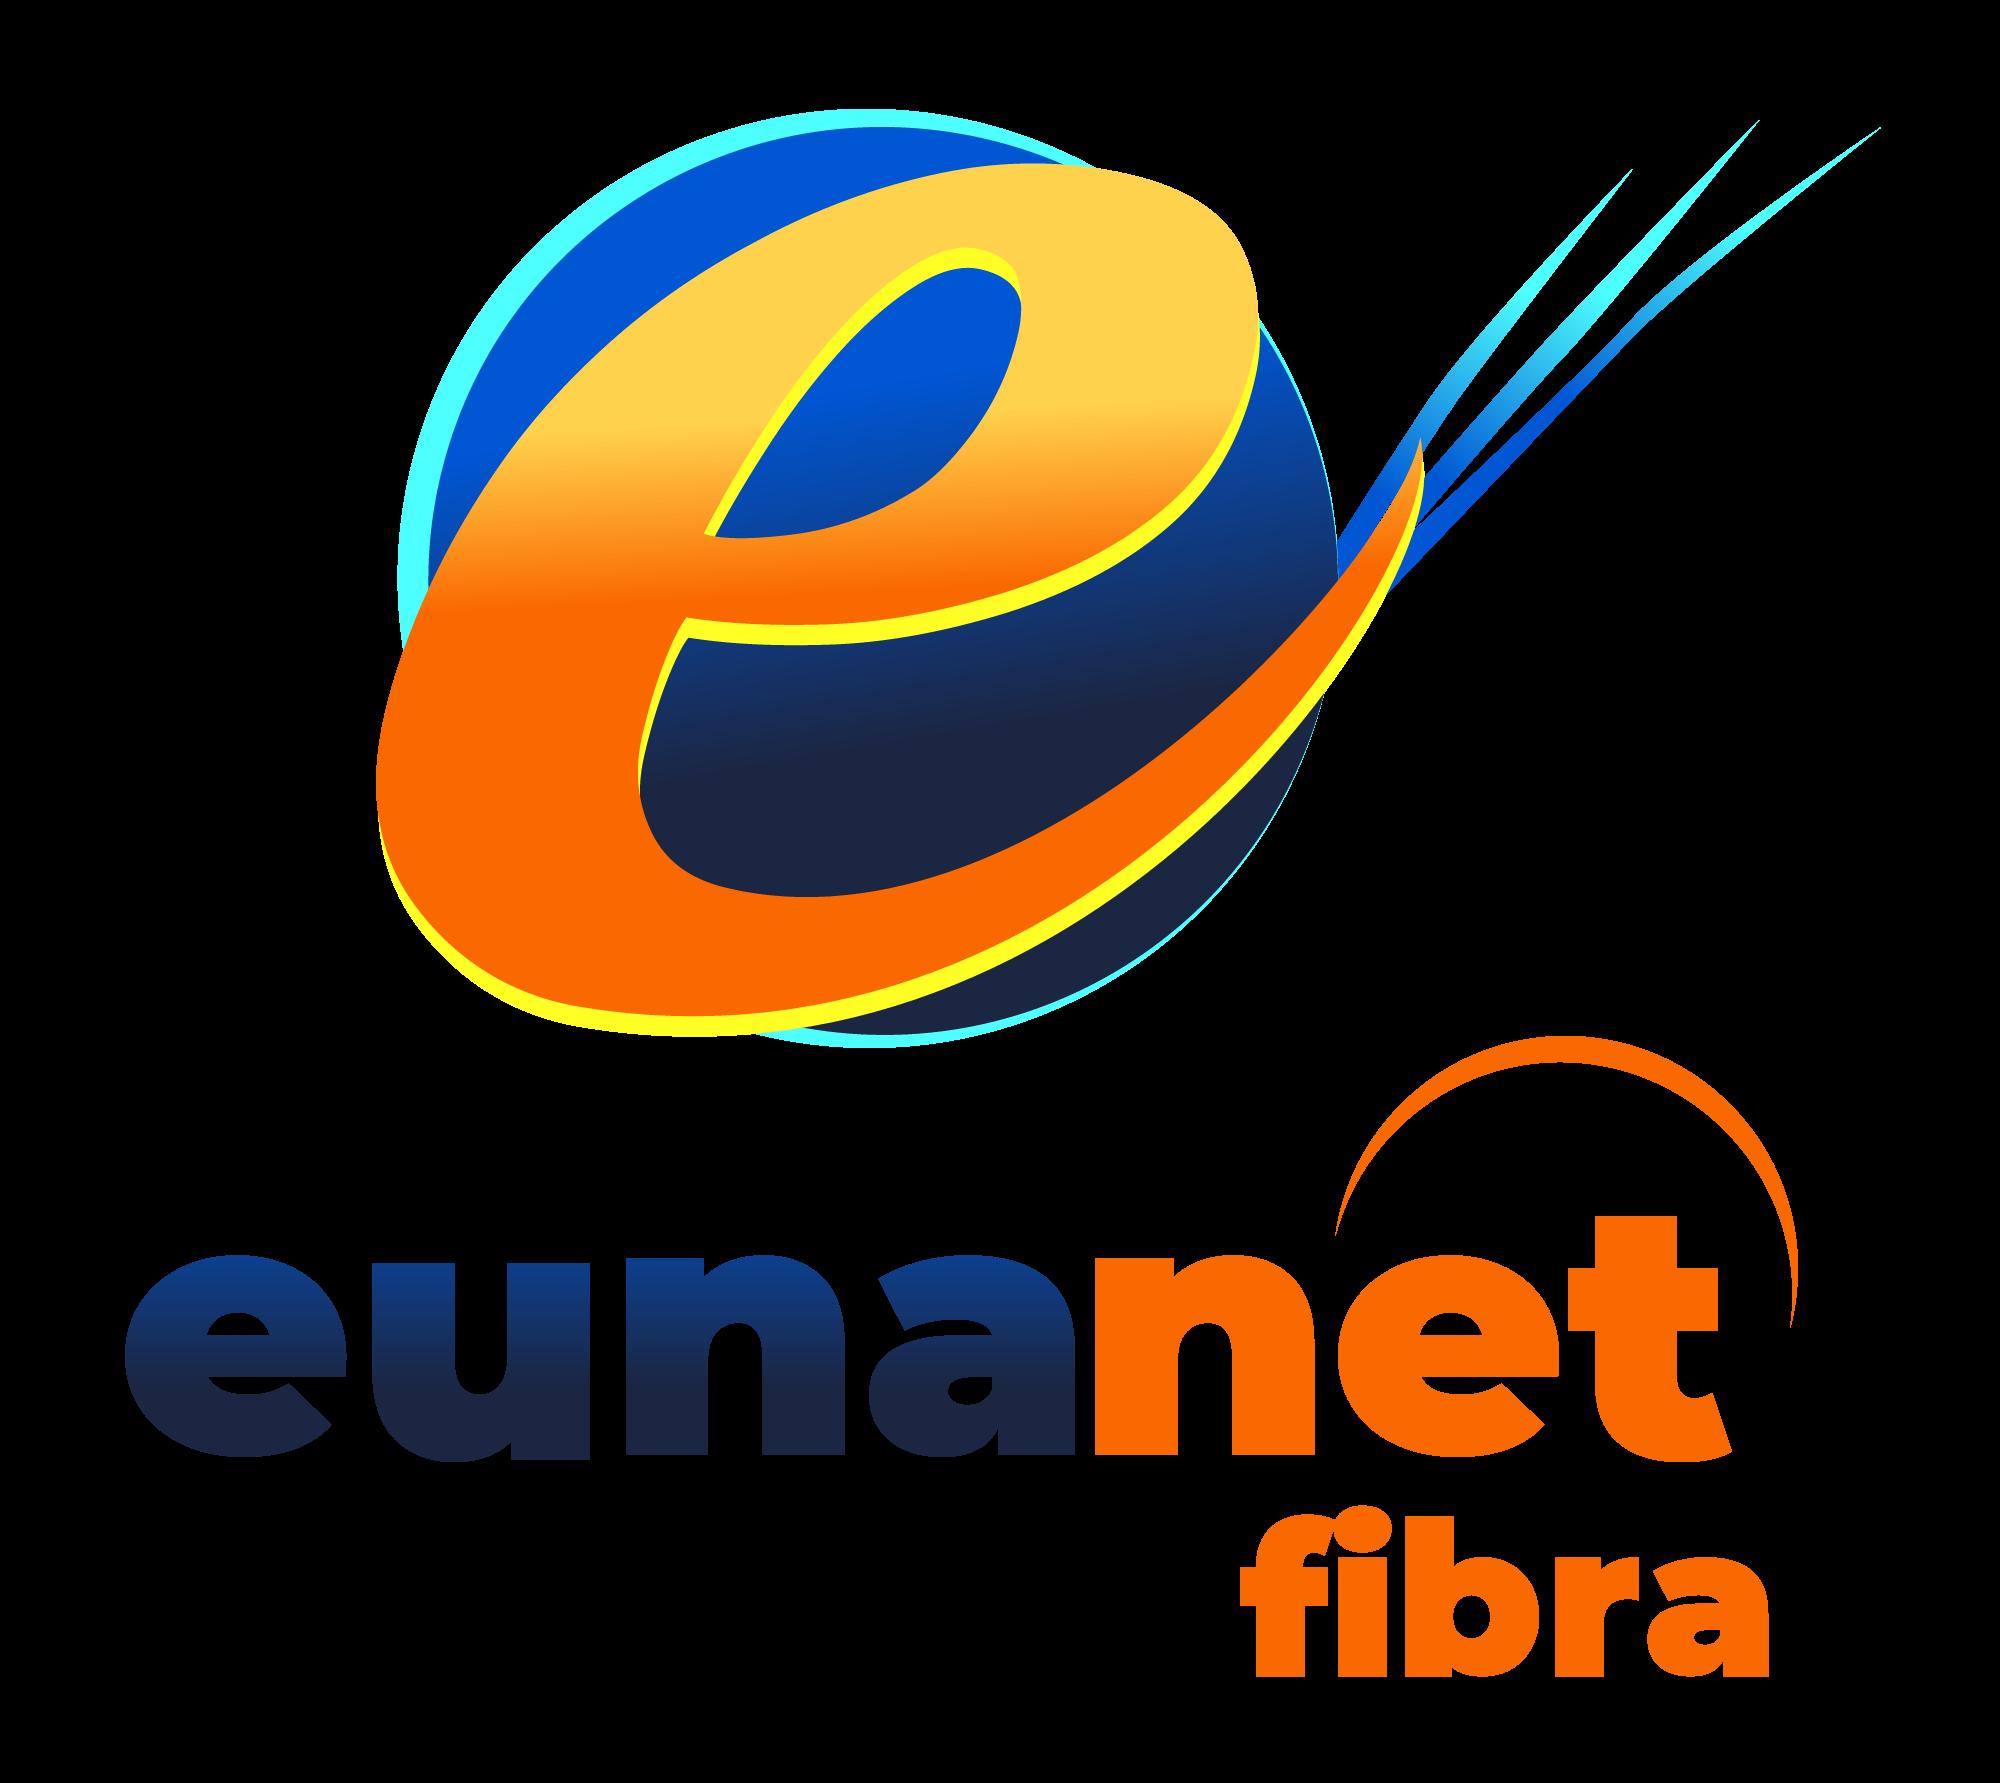 eunanetfibra